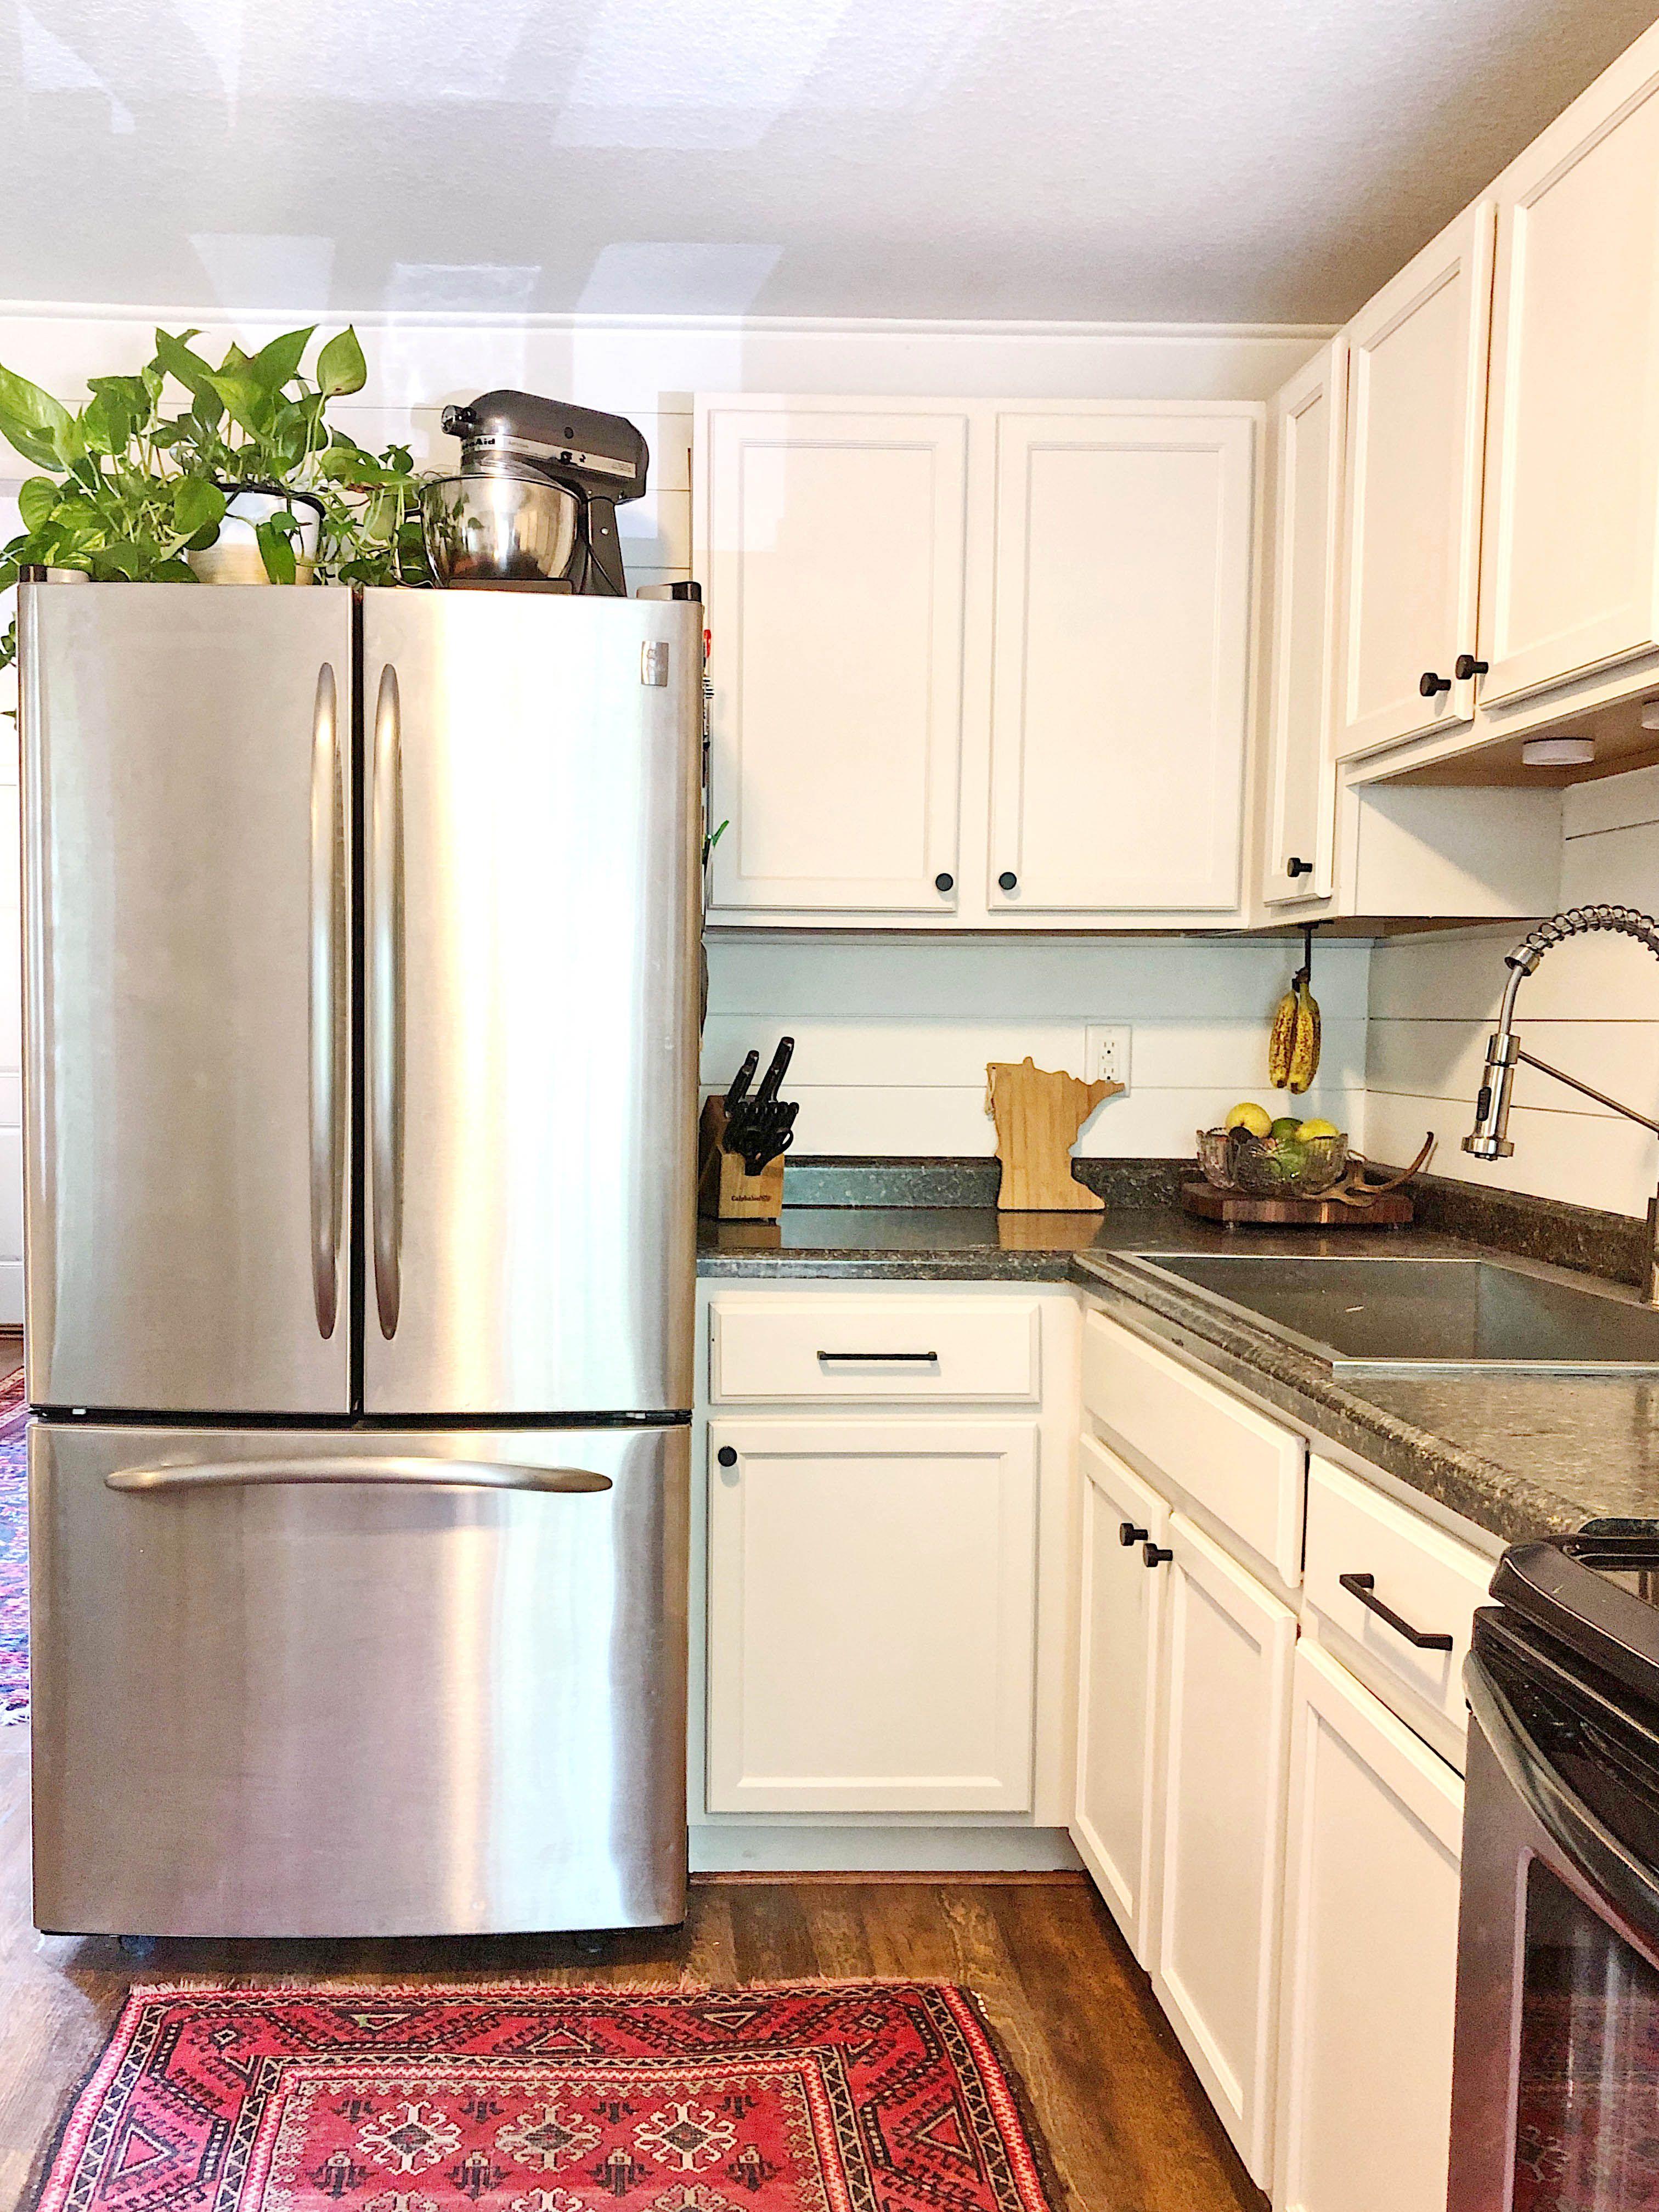 Fresh Update To Brighten A Dark And Small Kitchen Cabinets Sw 9109 Natural Linen Walls Sw 7008 Alabaster Kitchen Cabinets Kitchen Small Kitchen